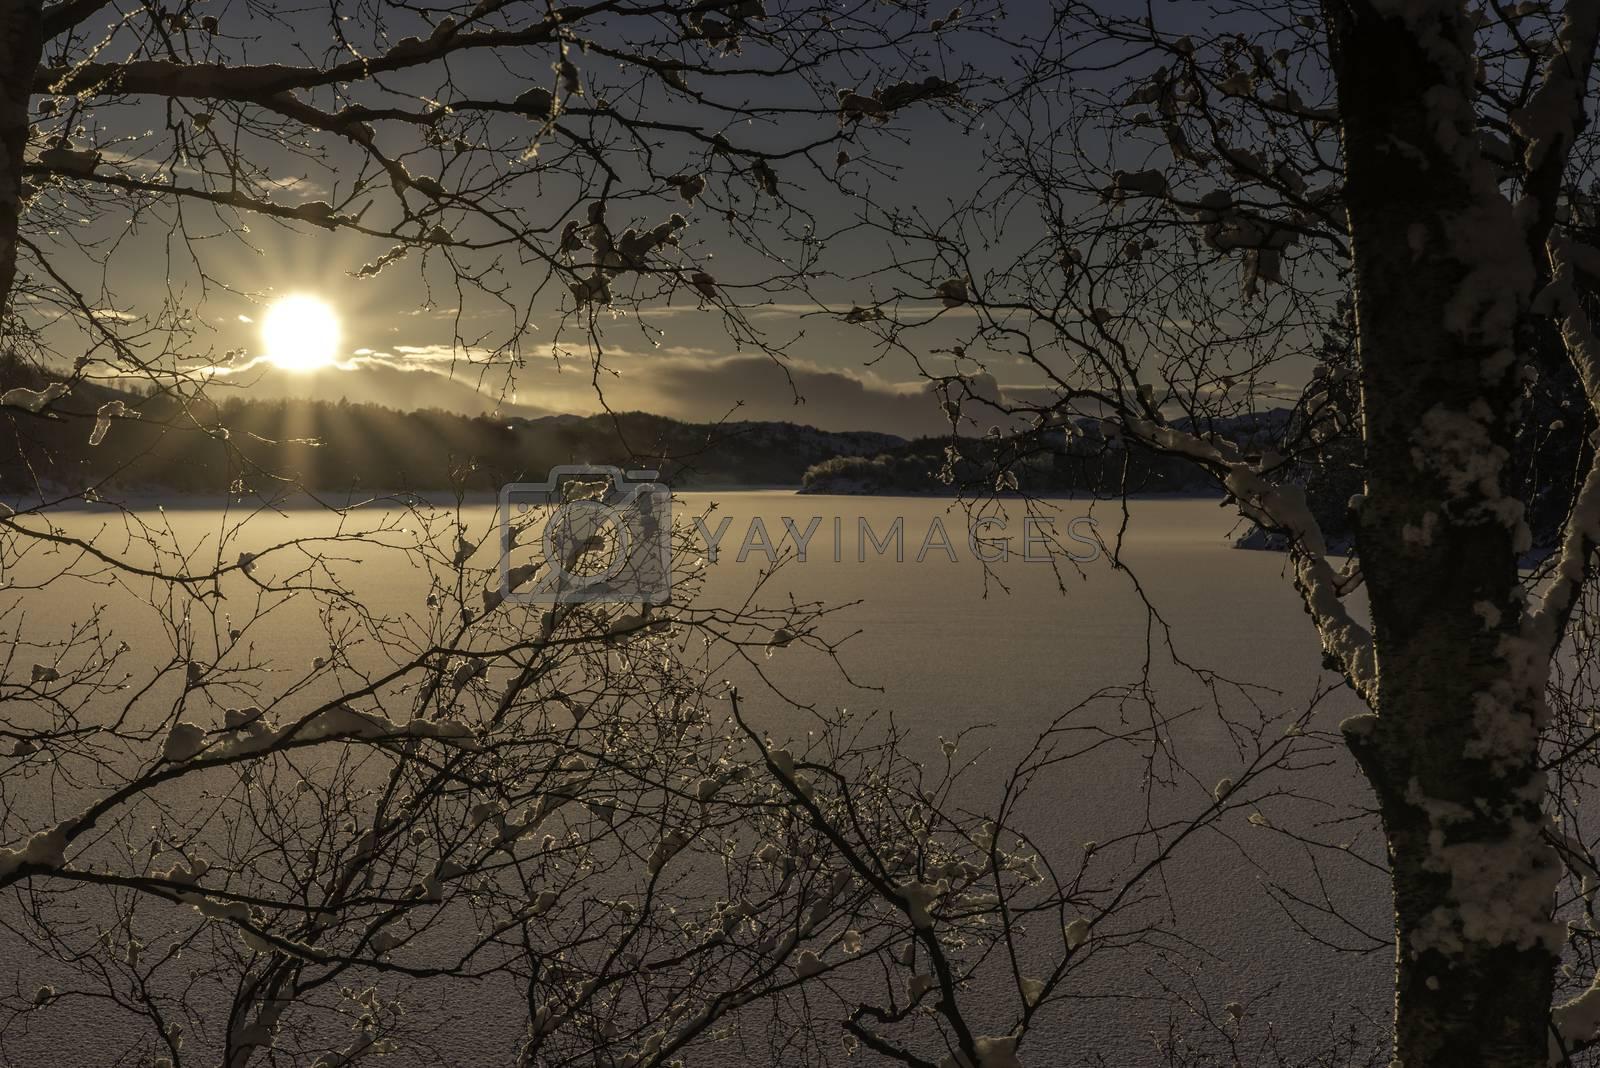 Solnedgang over Eiavatnet i Rogaland by vidar.fredheim@dabb.no